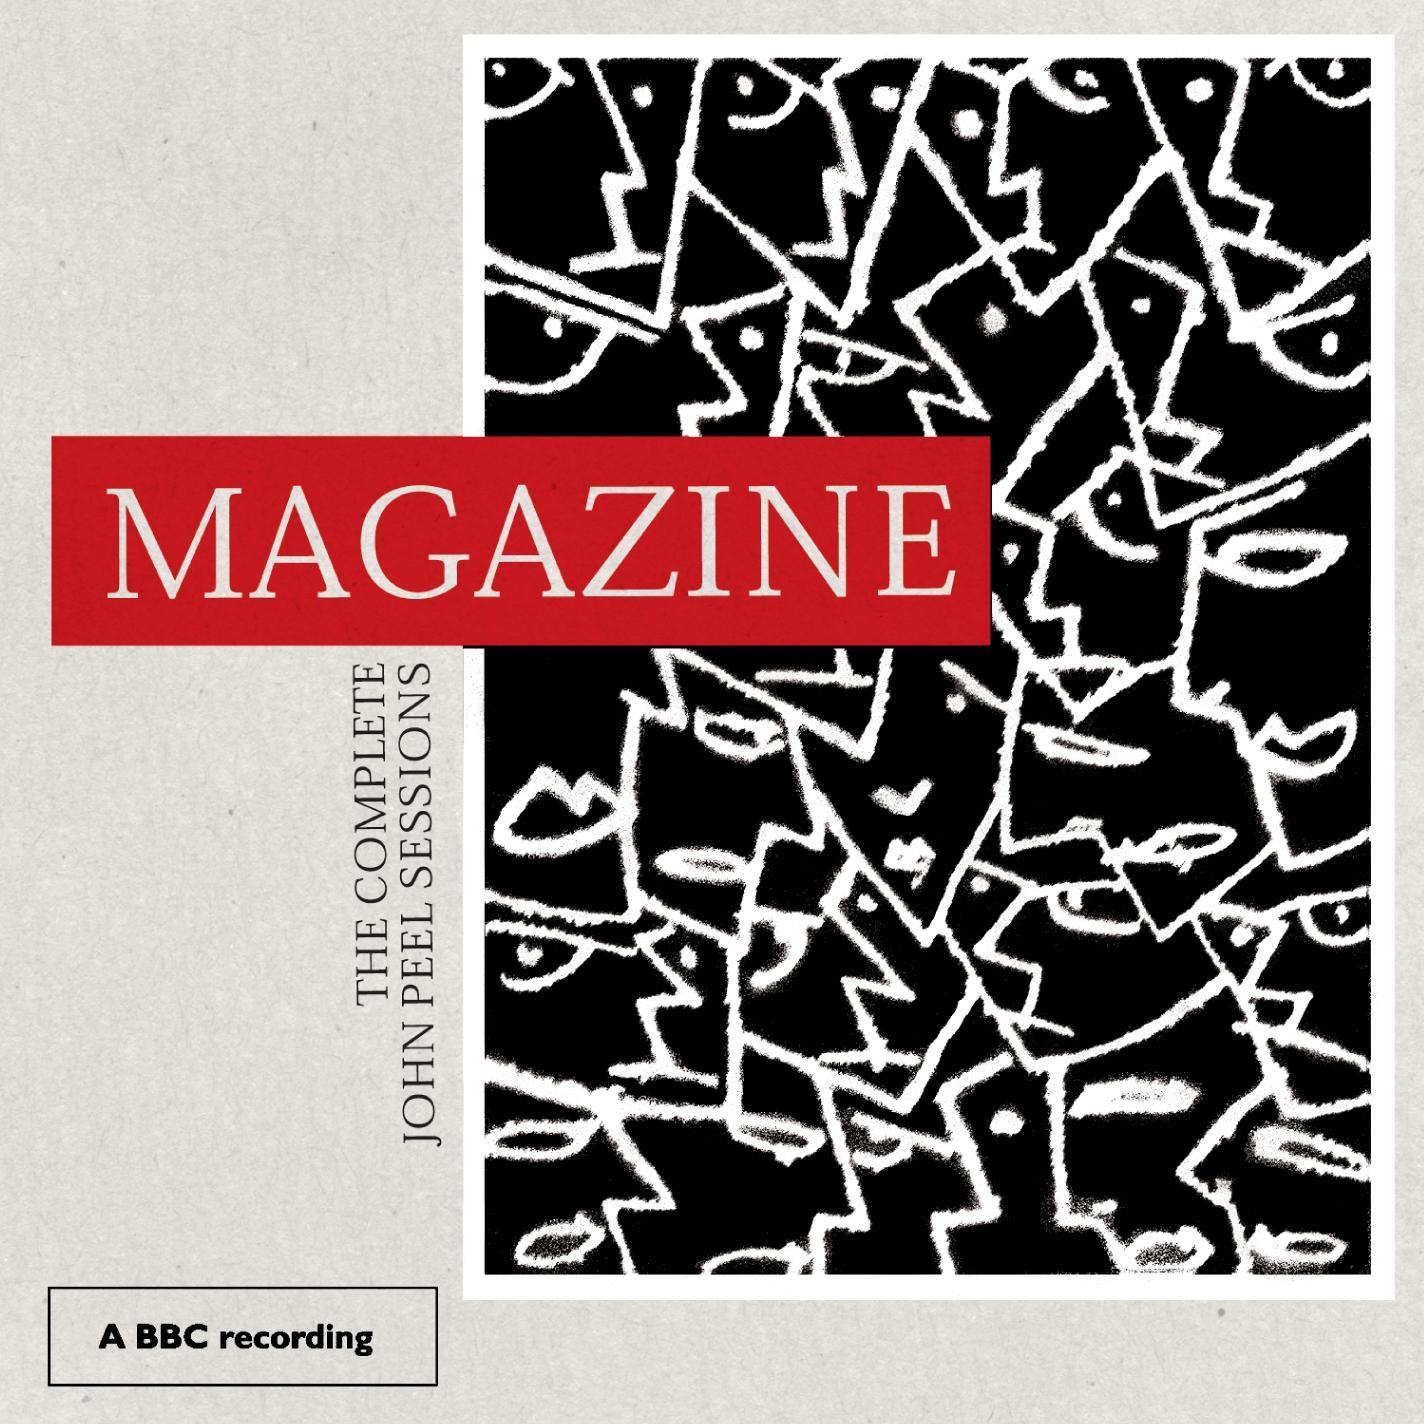 Magazine: The Peel Sessions